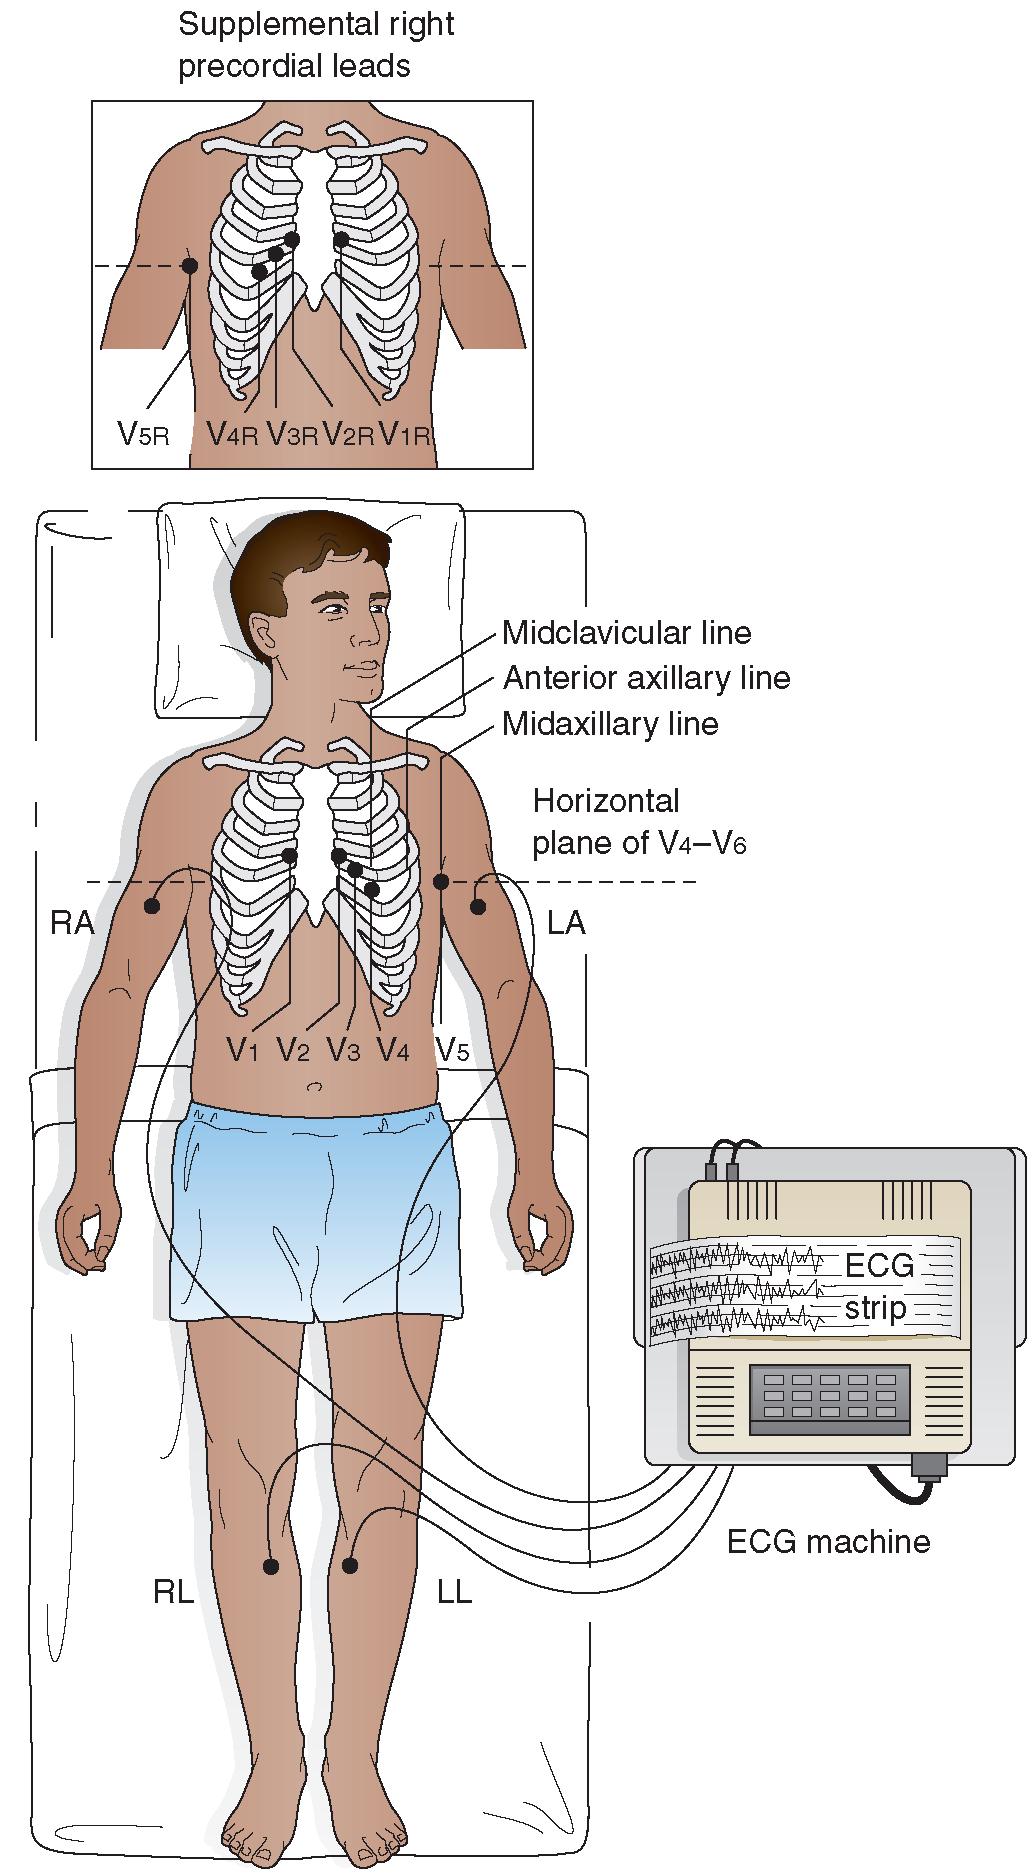 12 Lead Ekg Placement Diagram Single Phase Asynchronous Motor Wiring Twelve Electrocardiogram Ecg Electrode Placemen